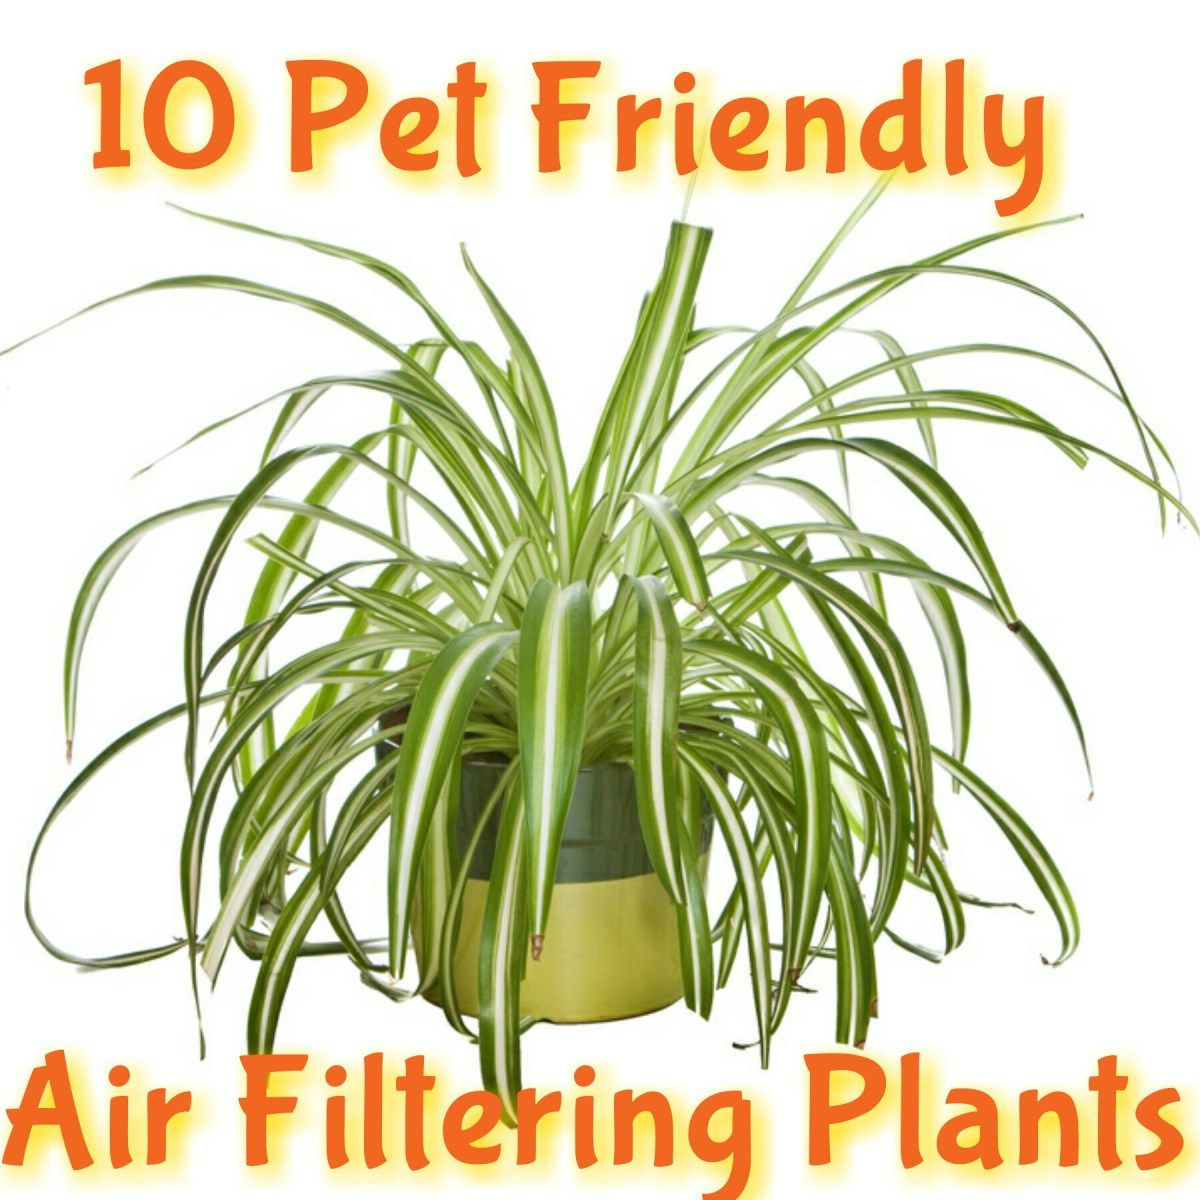 10 Kid Pet Friendly Air Filtering Plants Air Filtering Plants